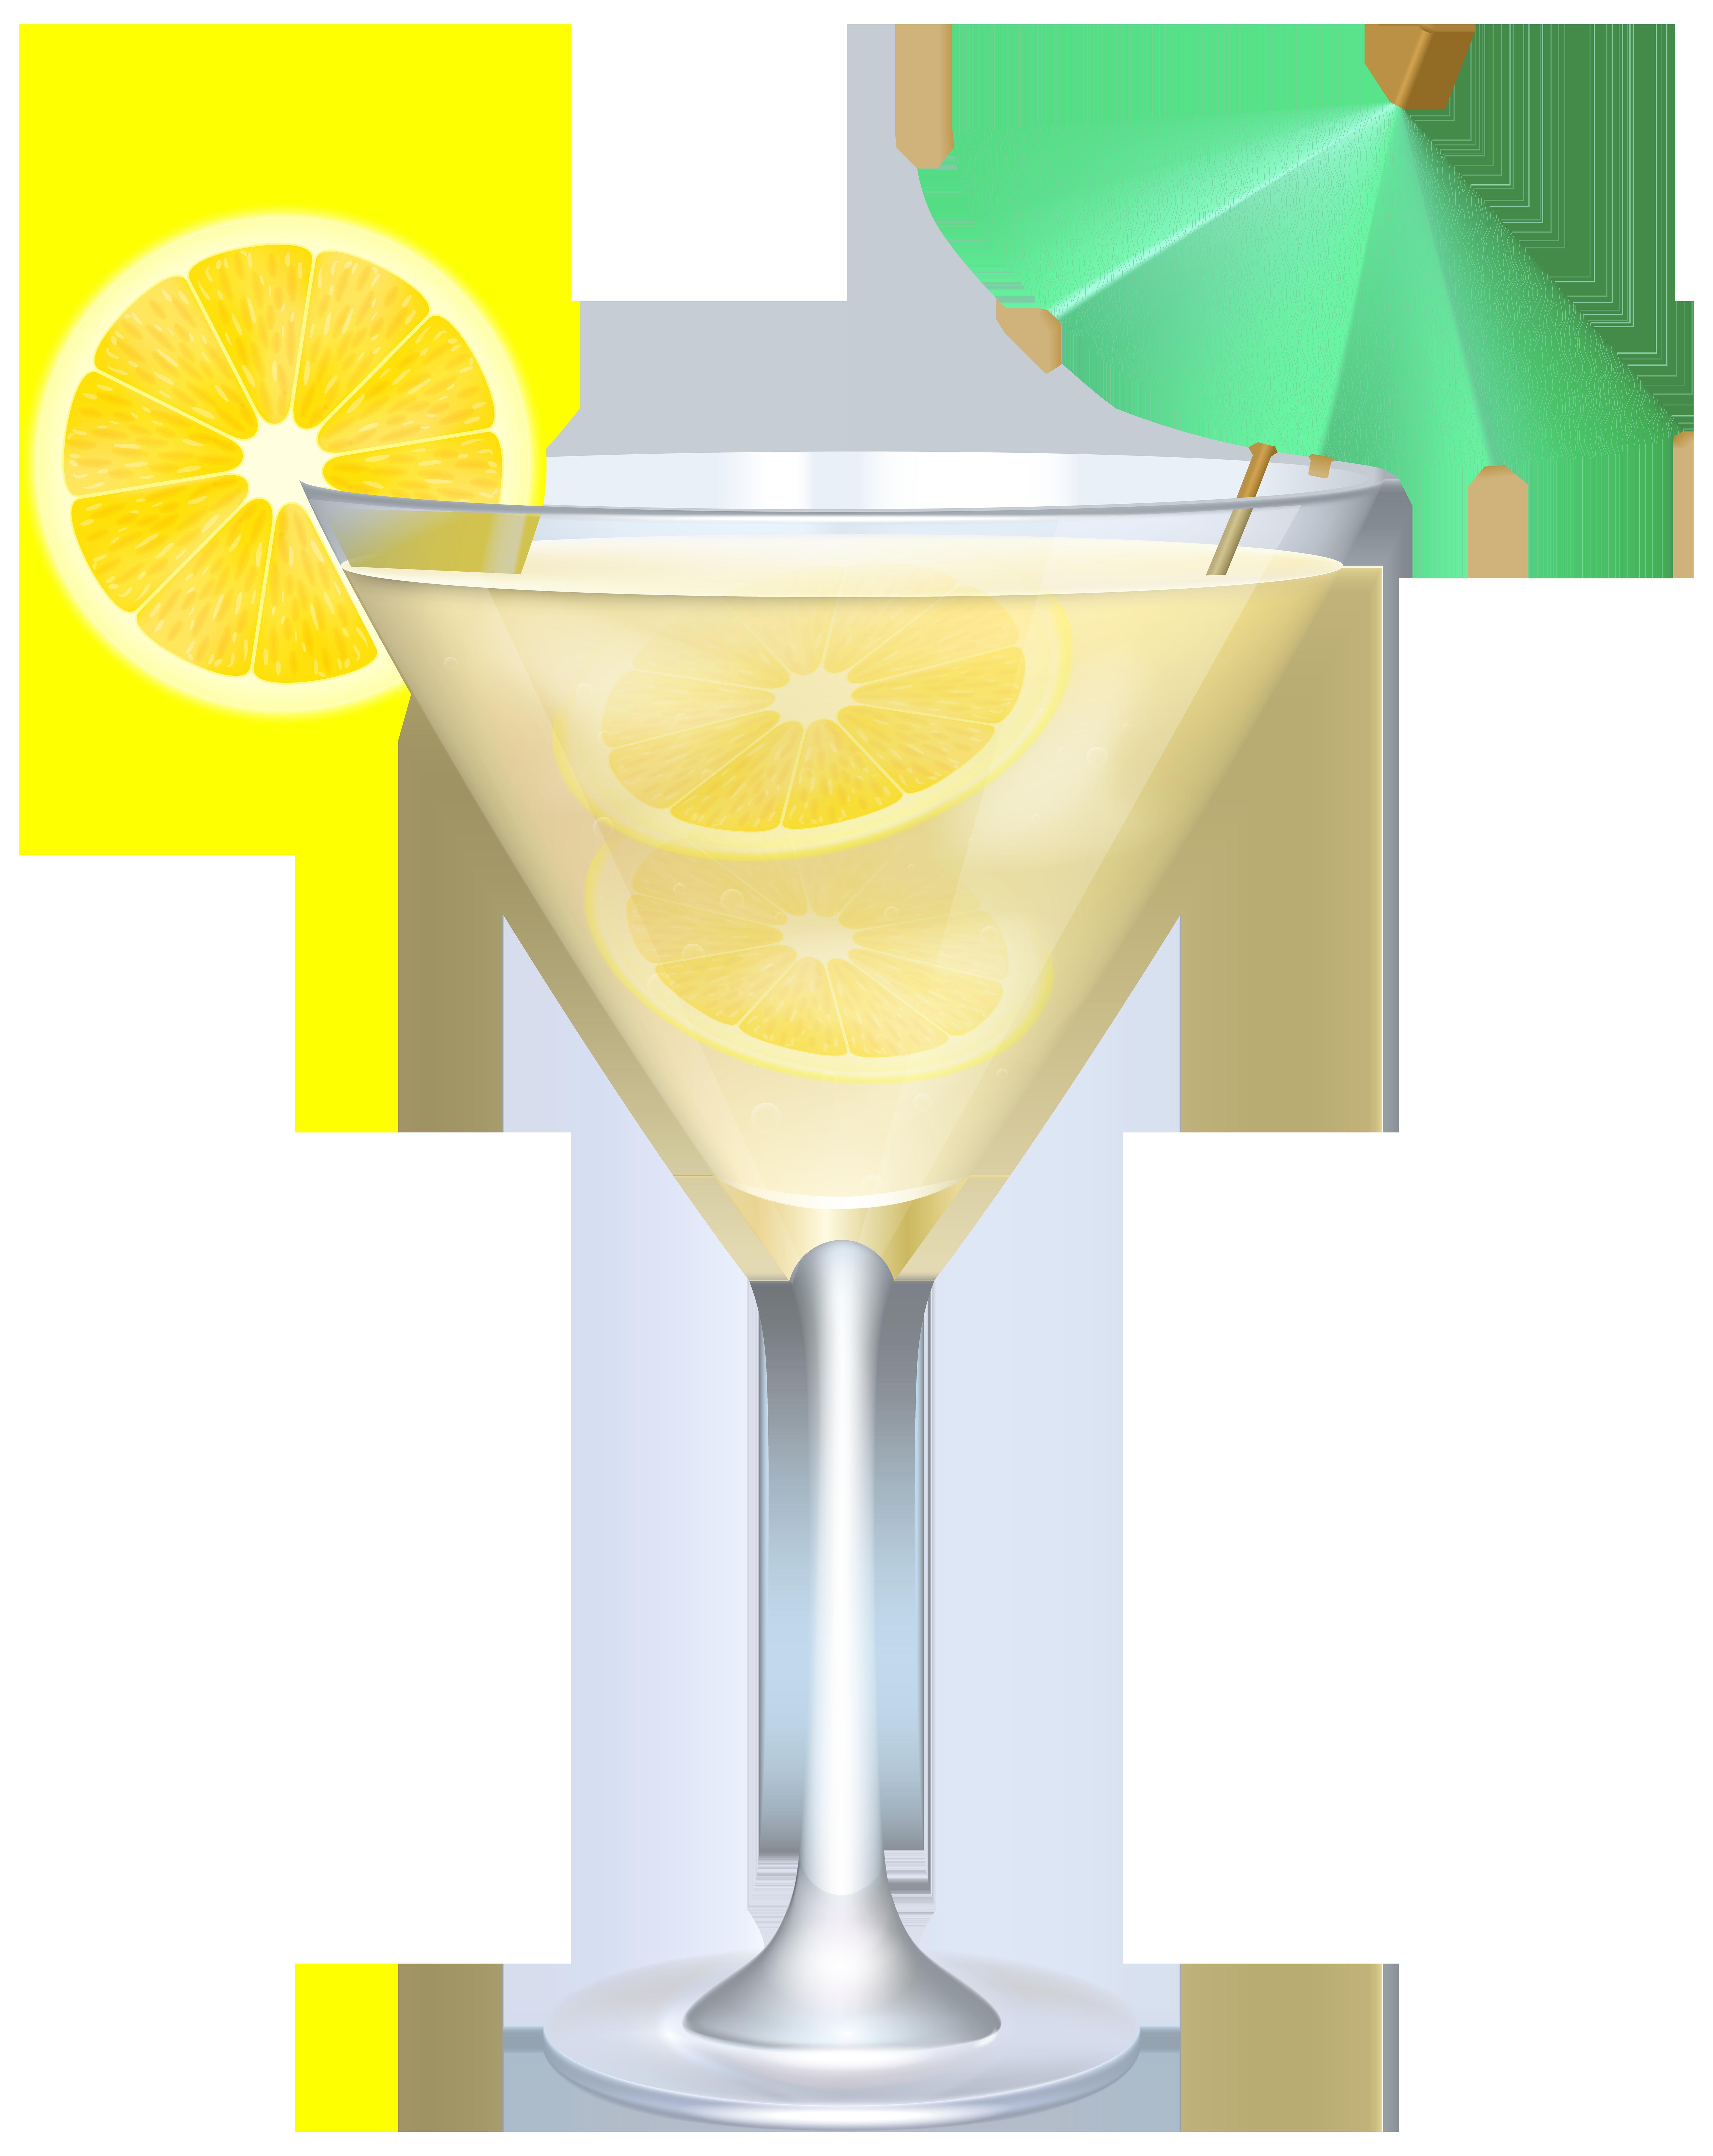 Lemondrop shot clipart clipart royalty free stock Lemon clipart lemon drop, Lemon lemon drop Transparent FREE for ... clipart royalty free stock